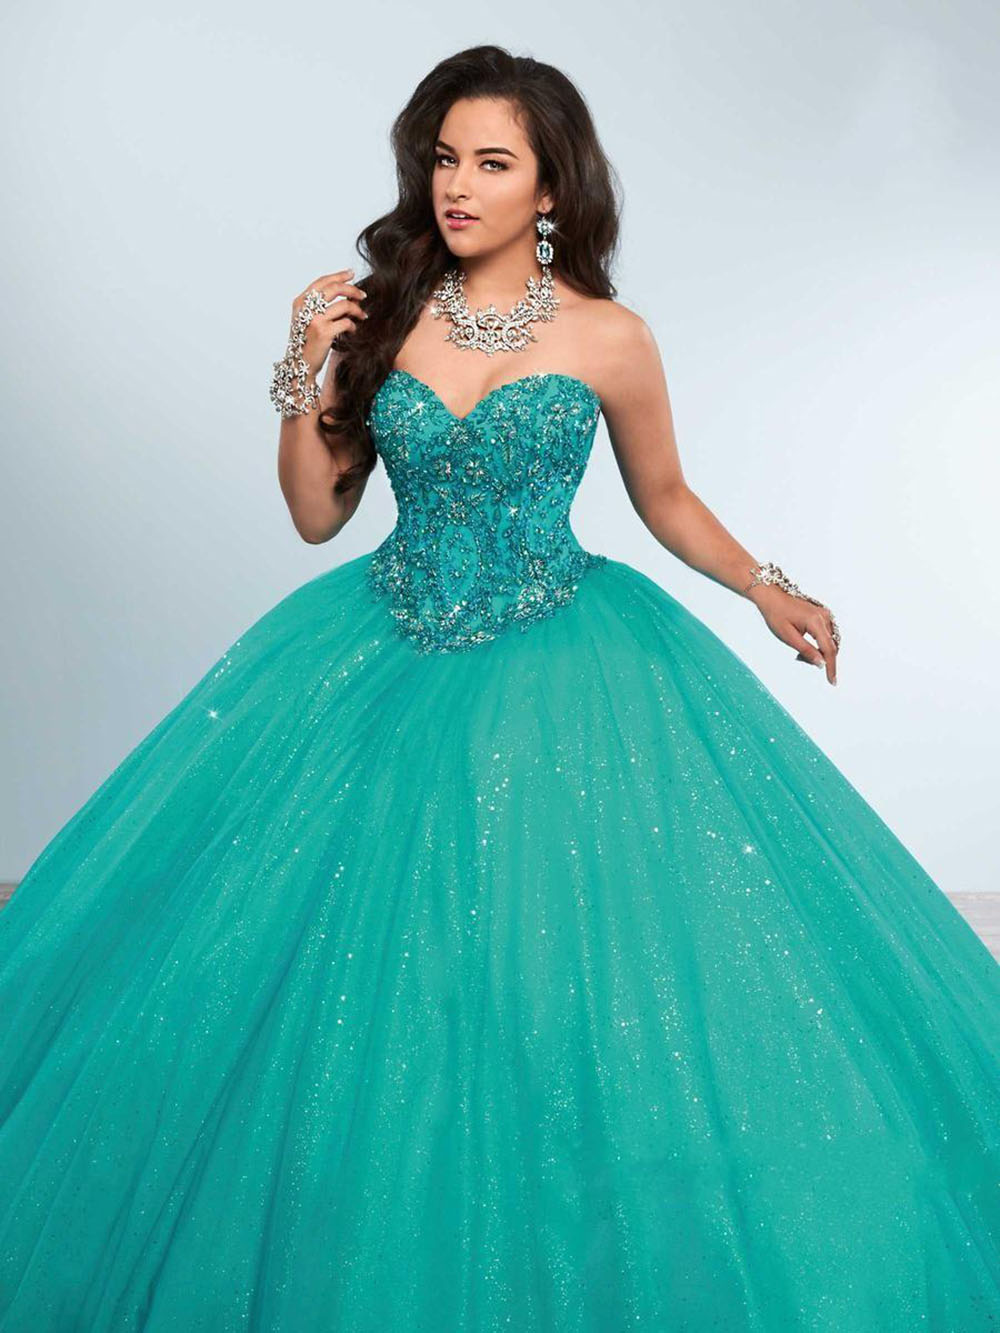 Grün Ballkleid Quinceanera Kleider Schatz Kristall Perlen Tüll Bodenlangen Korsett Masquerade Ball Kleider Süße Kleid